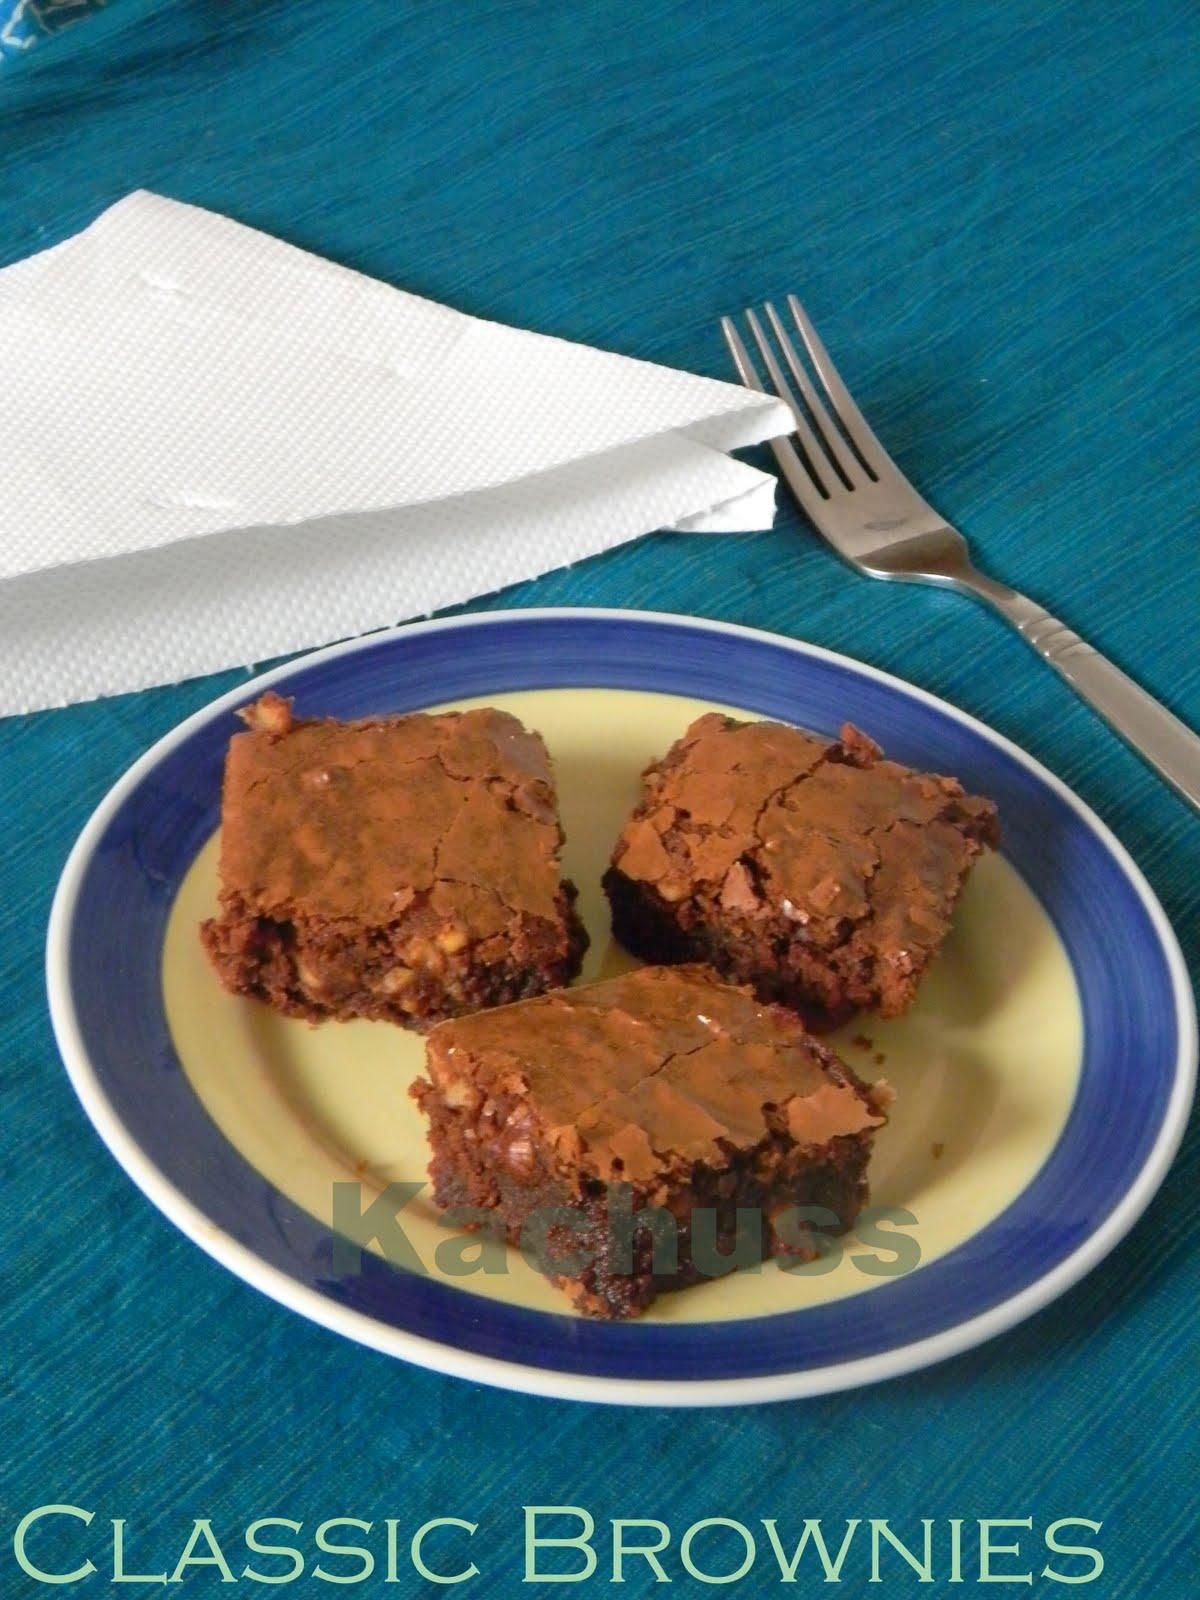 Kachuss Delights: Classic Brownies